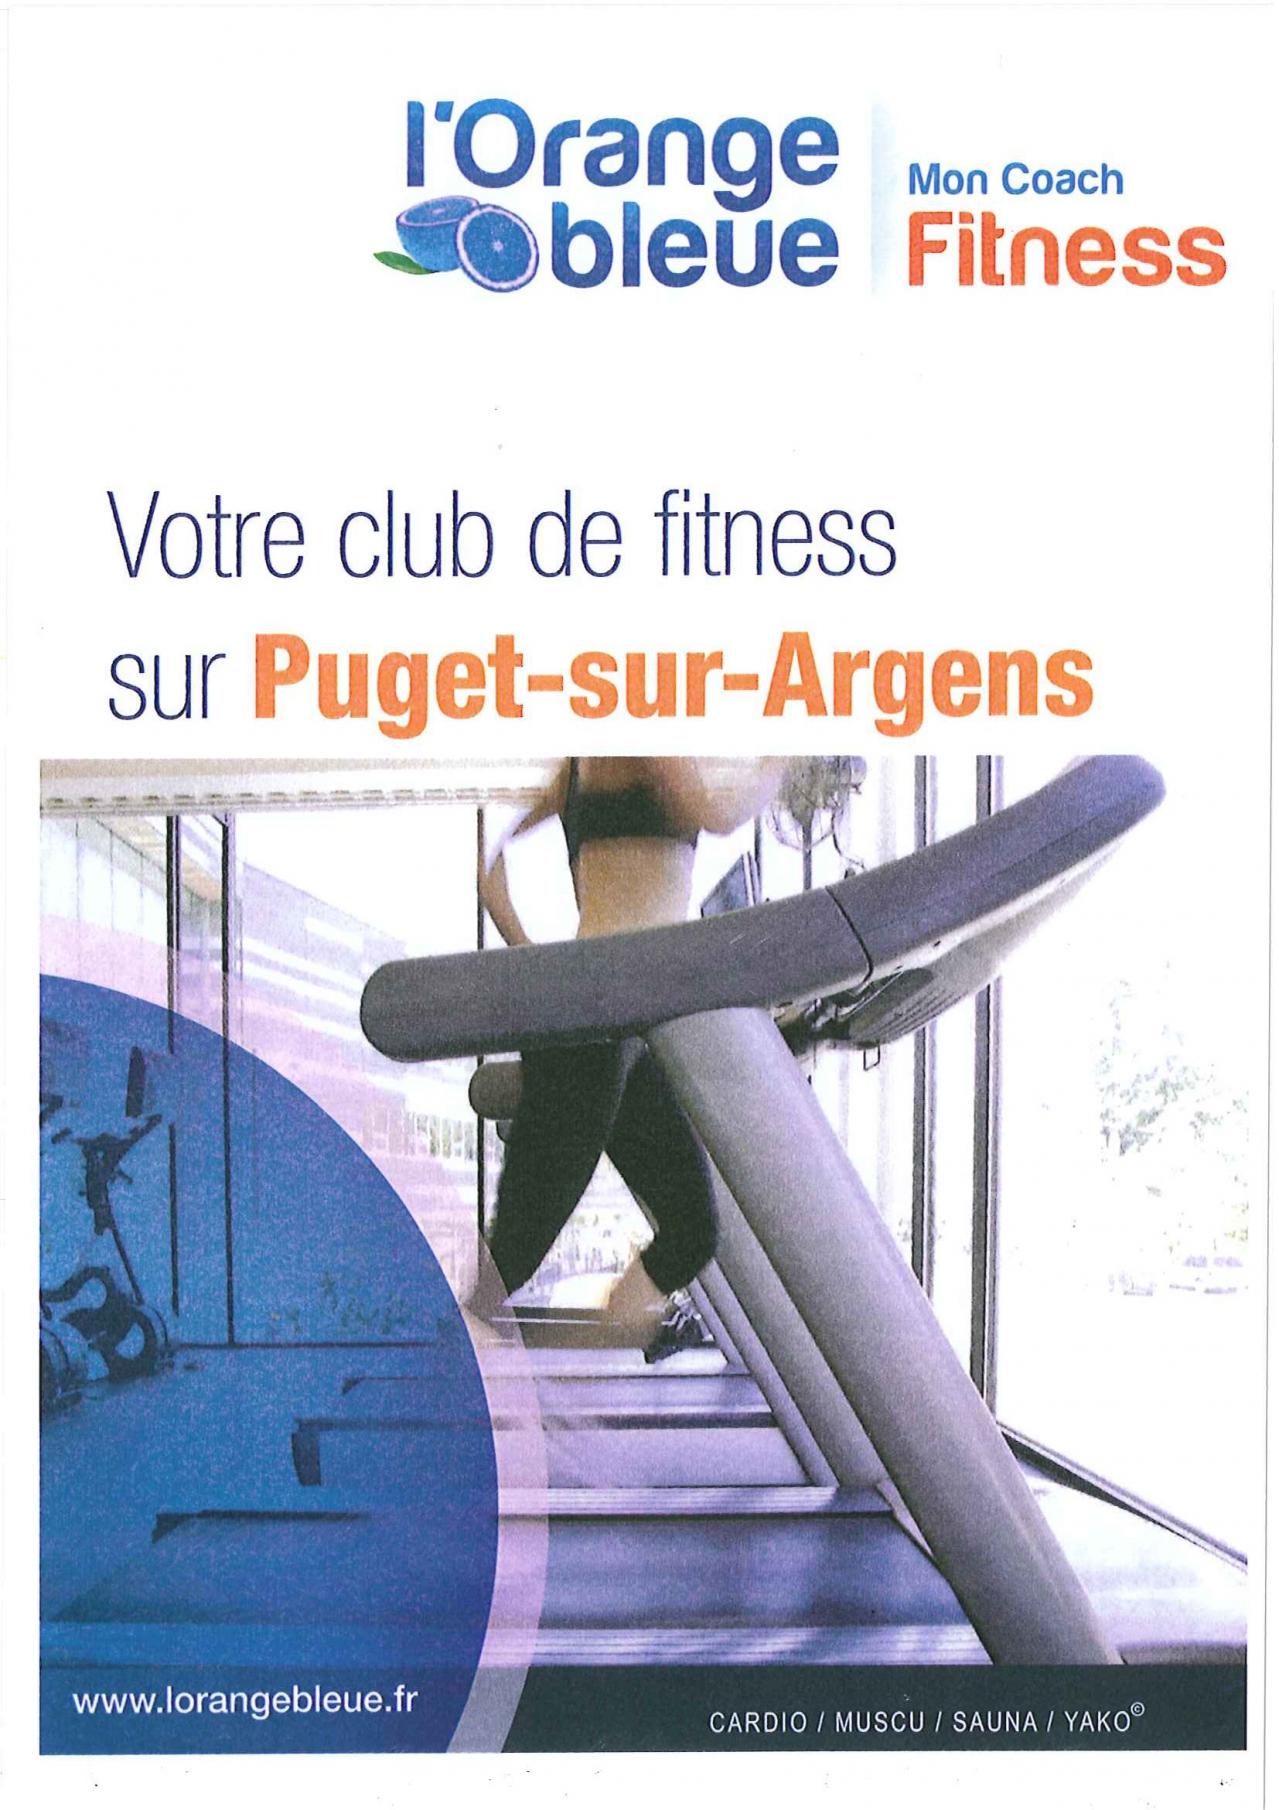 club de fitness orange bleue comit d 39 actions des oeuvres sociales. Black Bedroom Furniture Sets. Home Design Ideas